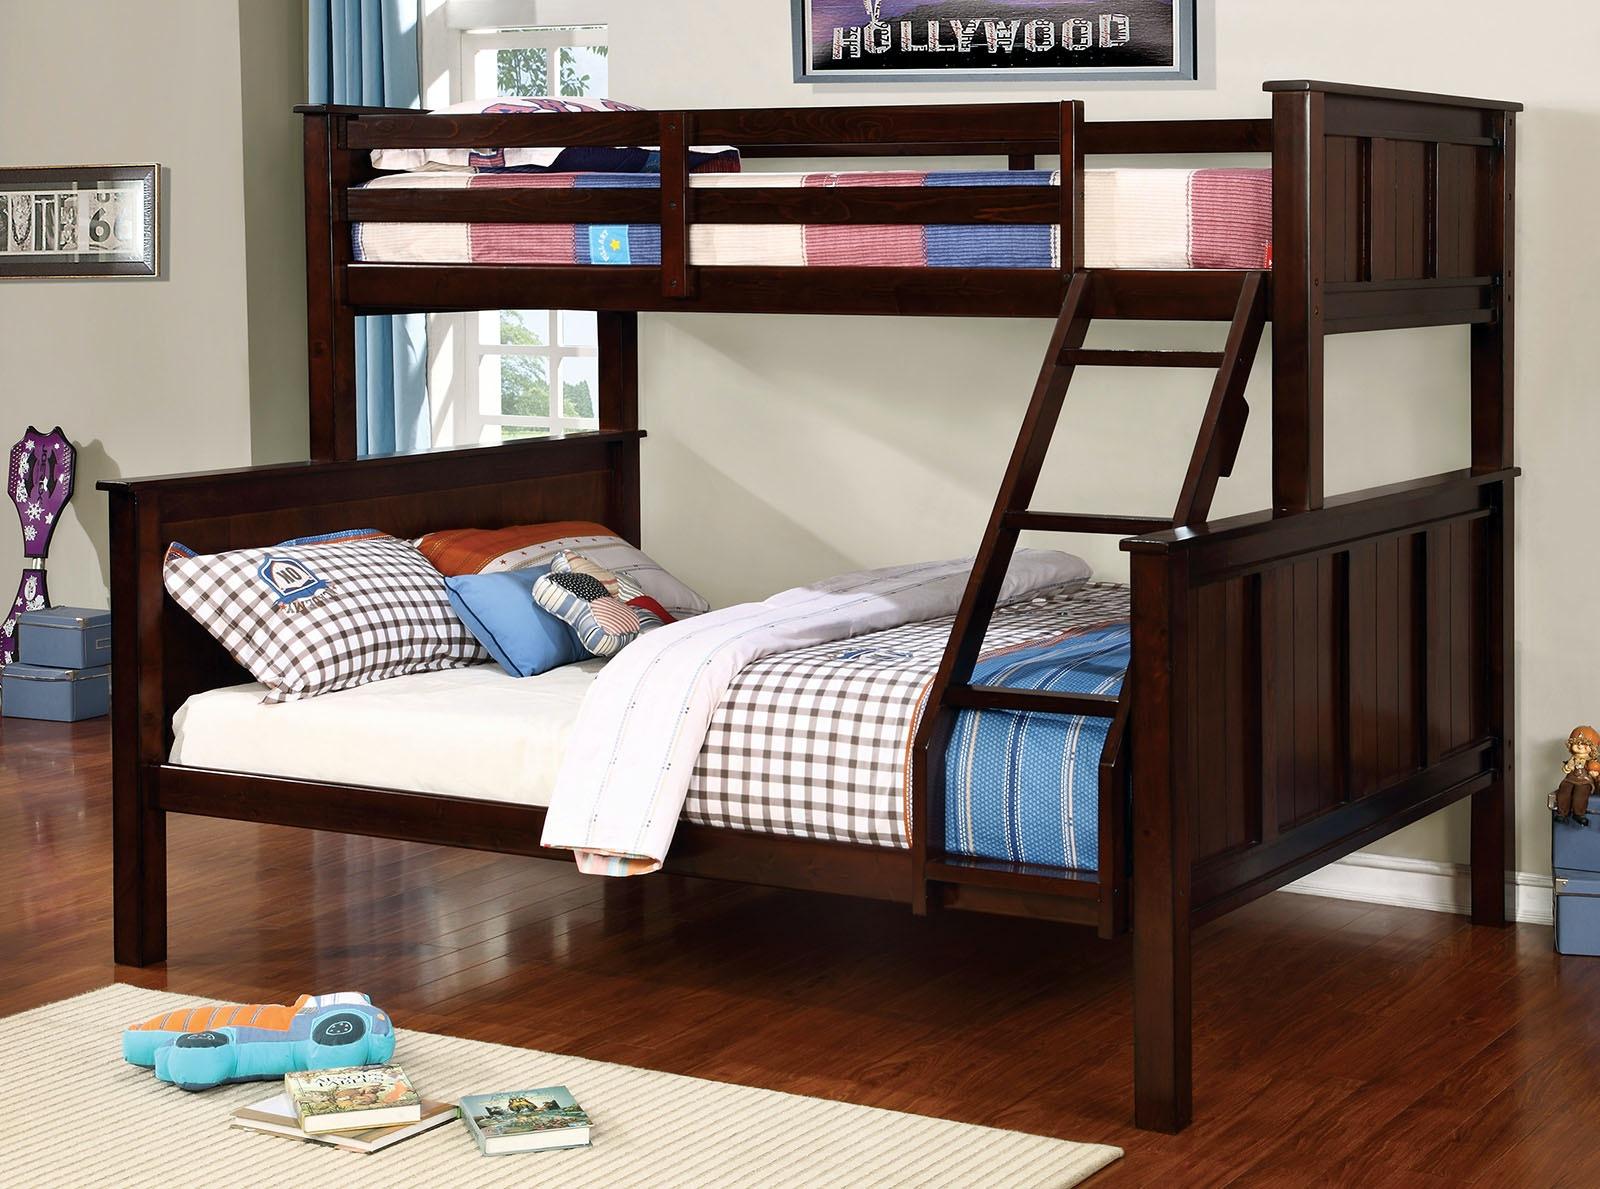 Furniture Of America Bedroom Twin Queen Bunk Bed Bottom Headboard Footboard 13 Pc Slats